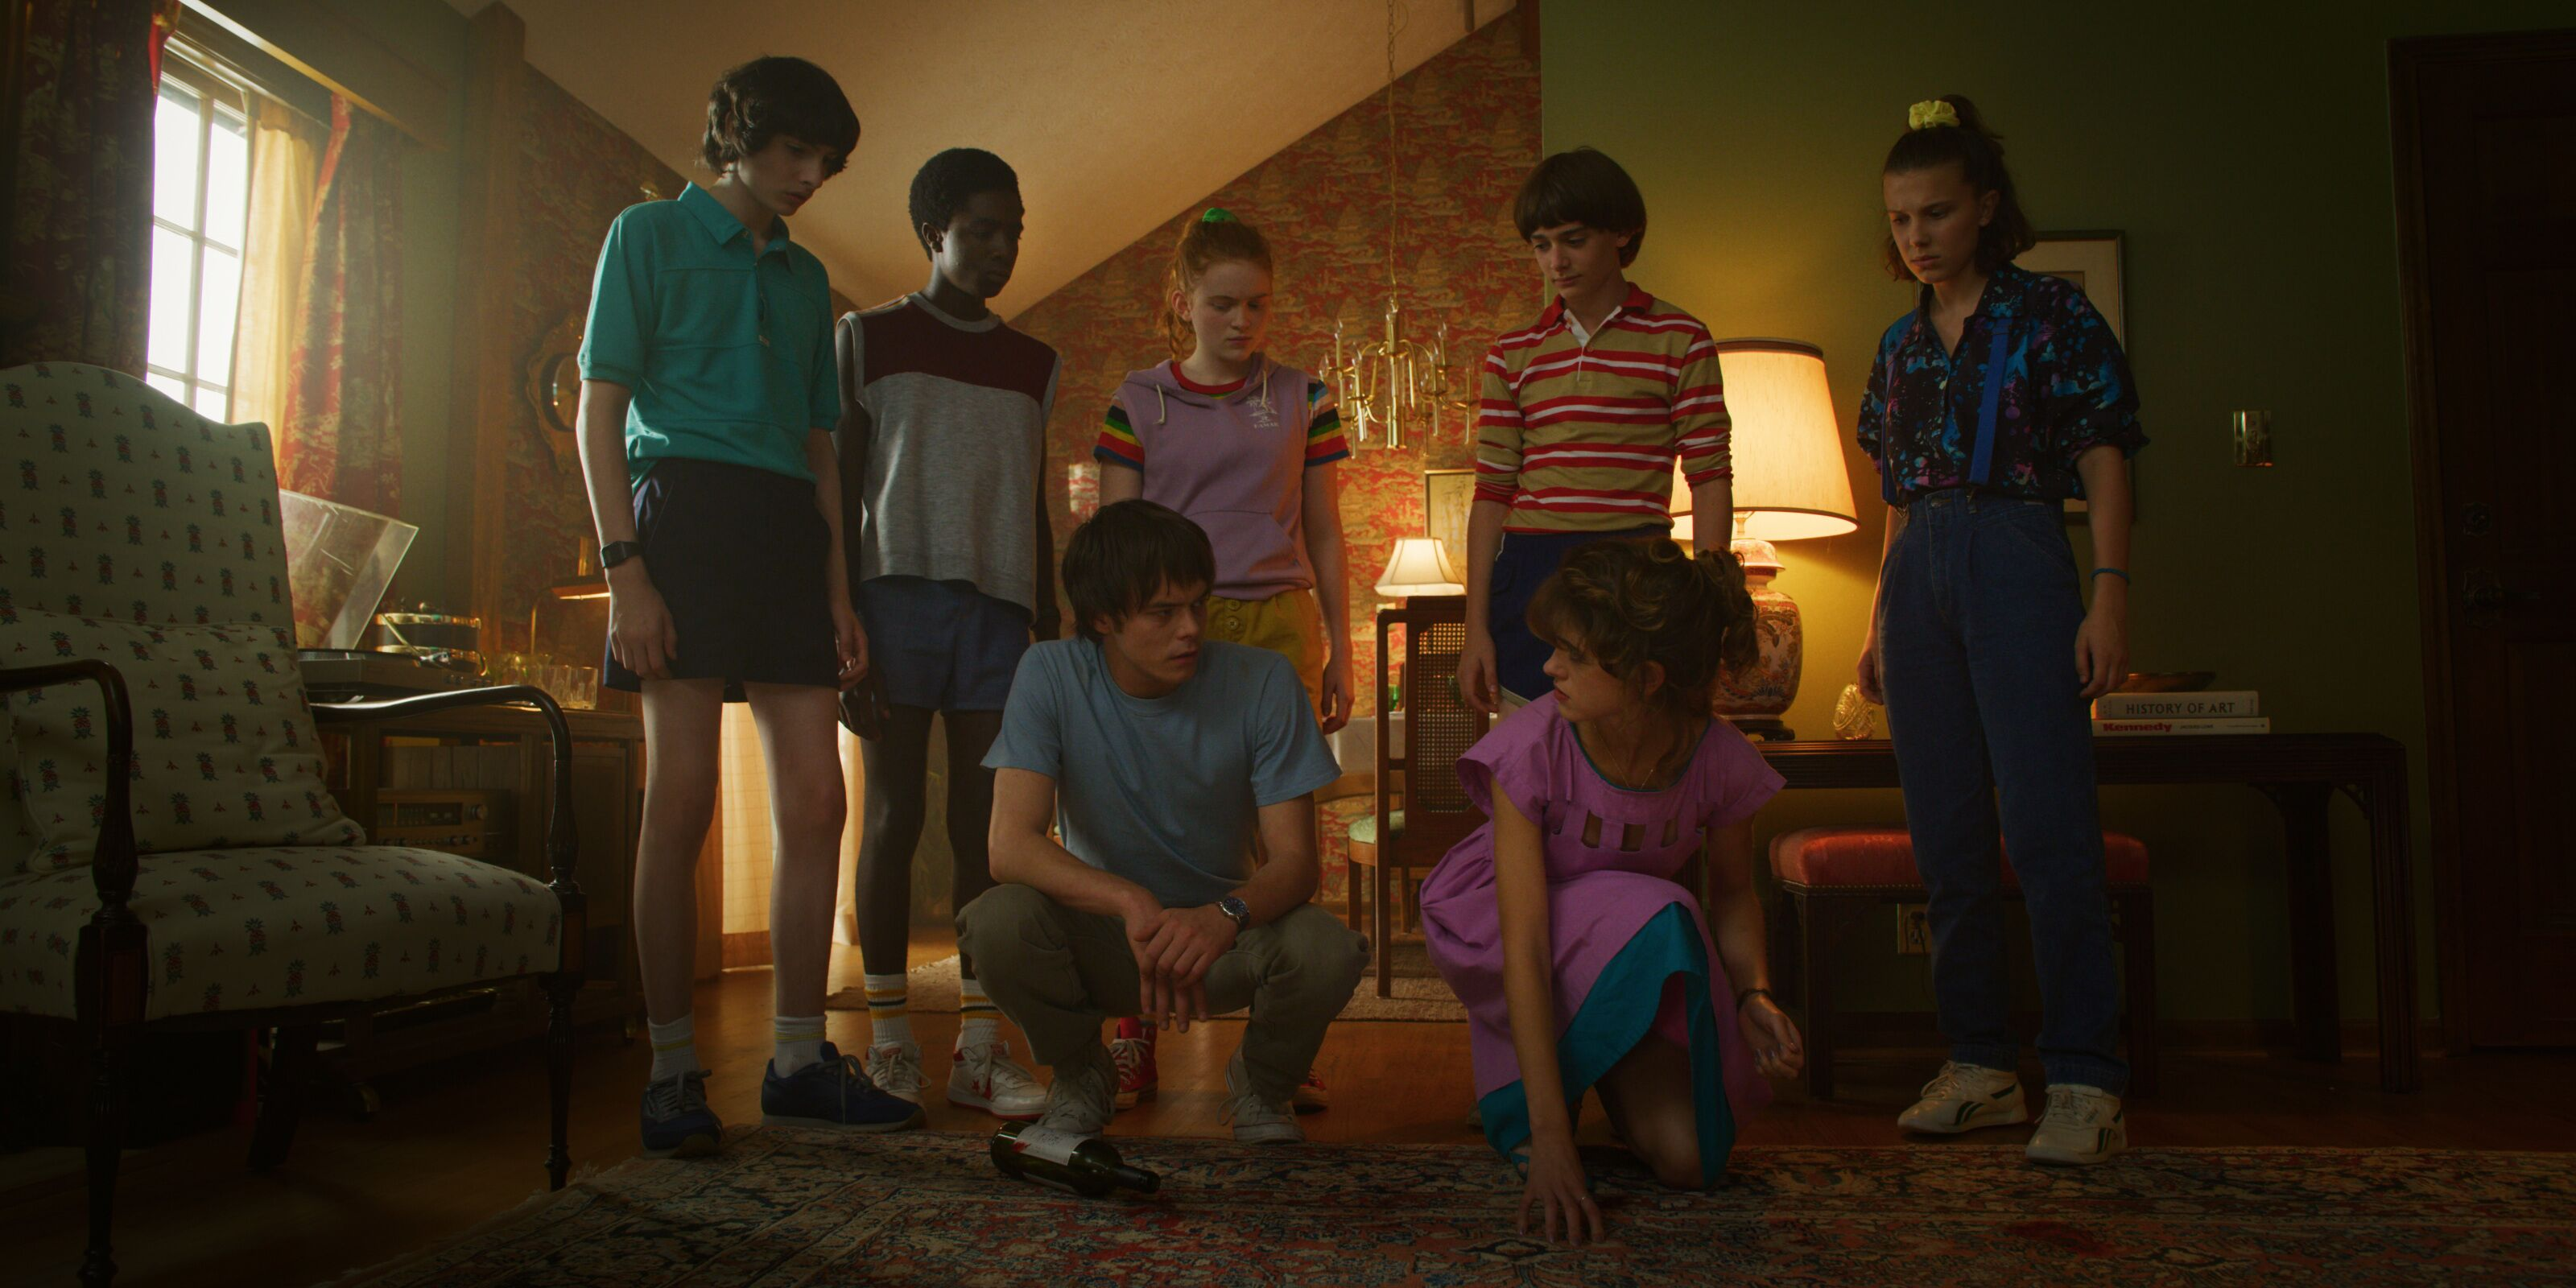 Stranger Things season 4 to begin filming in October?